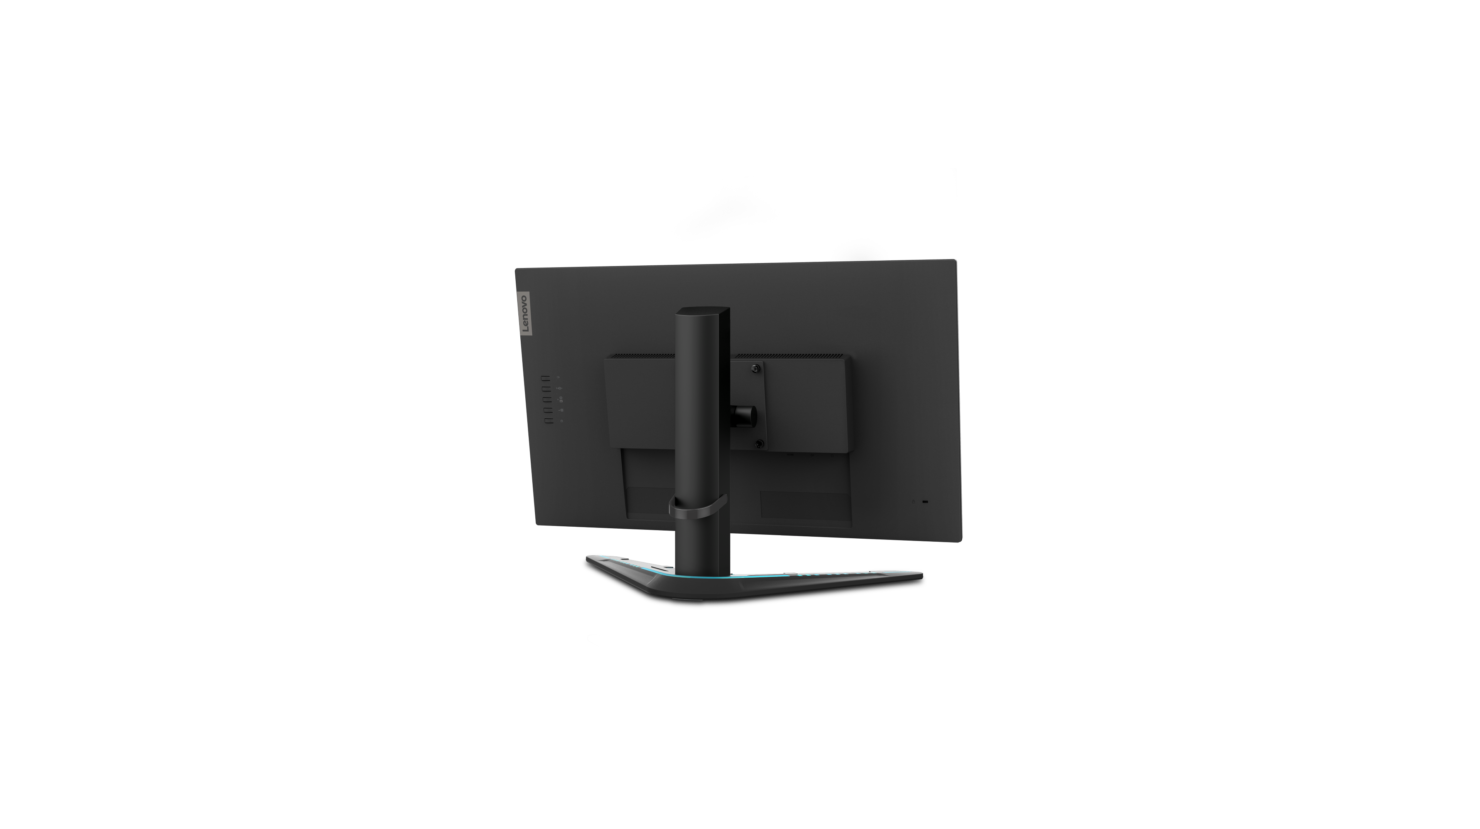 lenovo-g27-20-gaming-monitor_rear_facing_lowest_height-custom